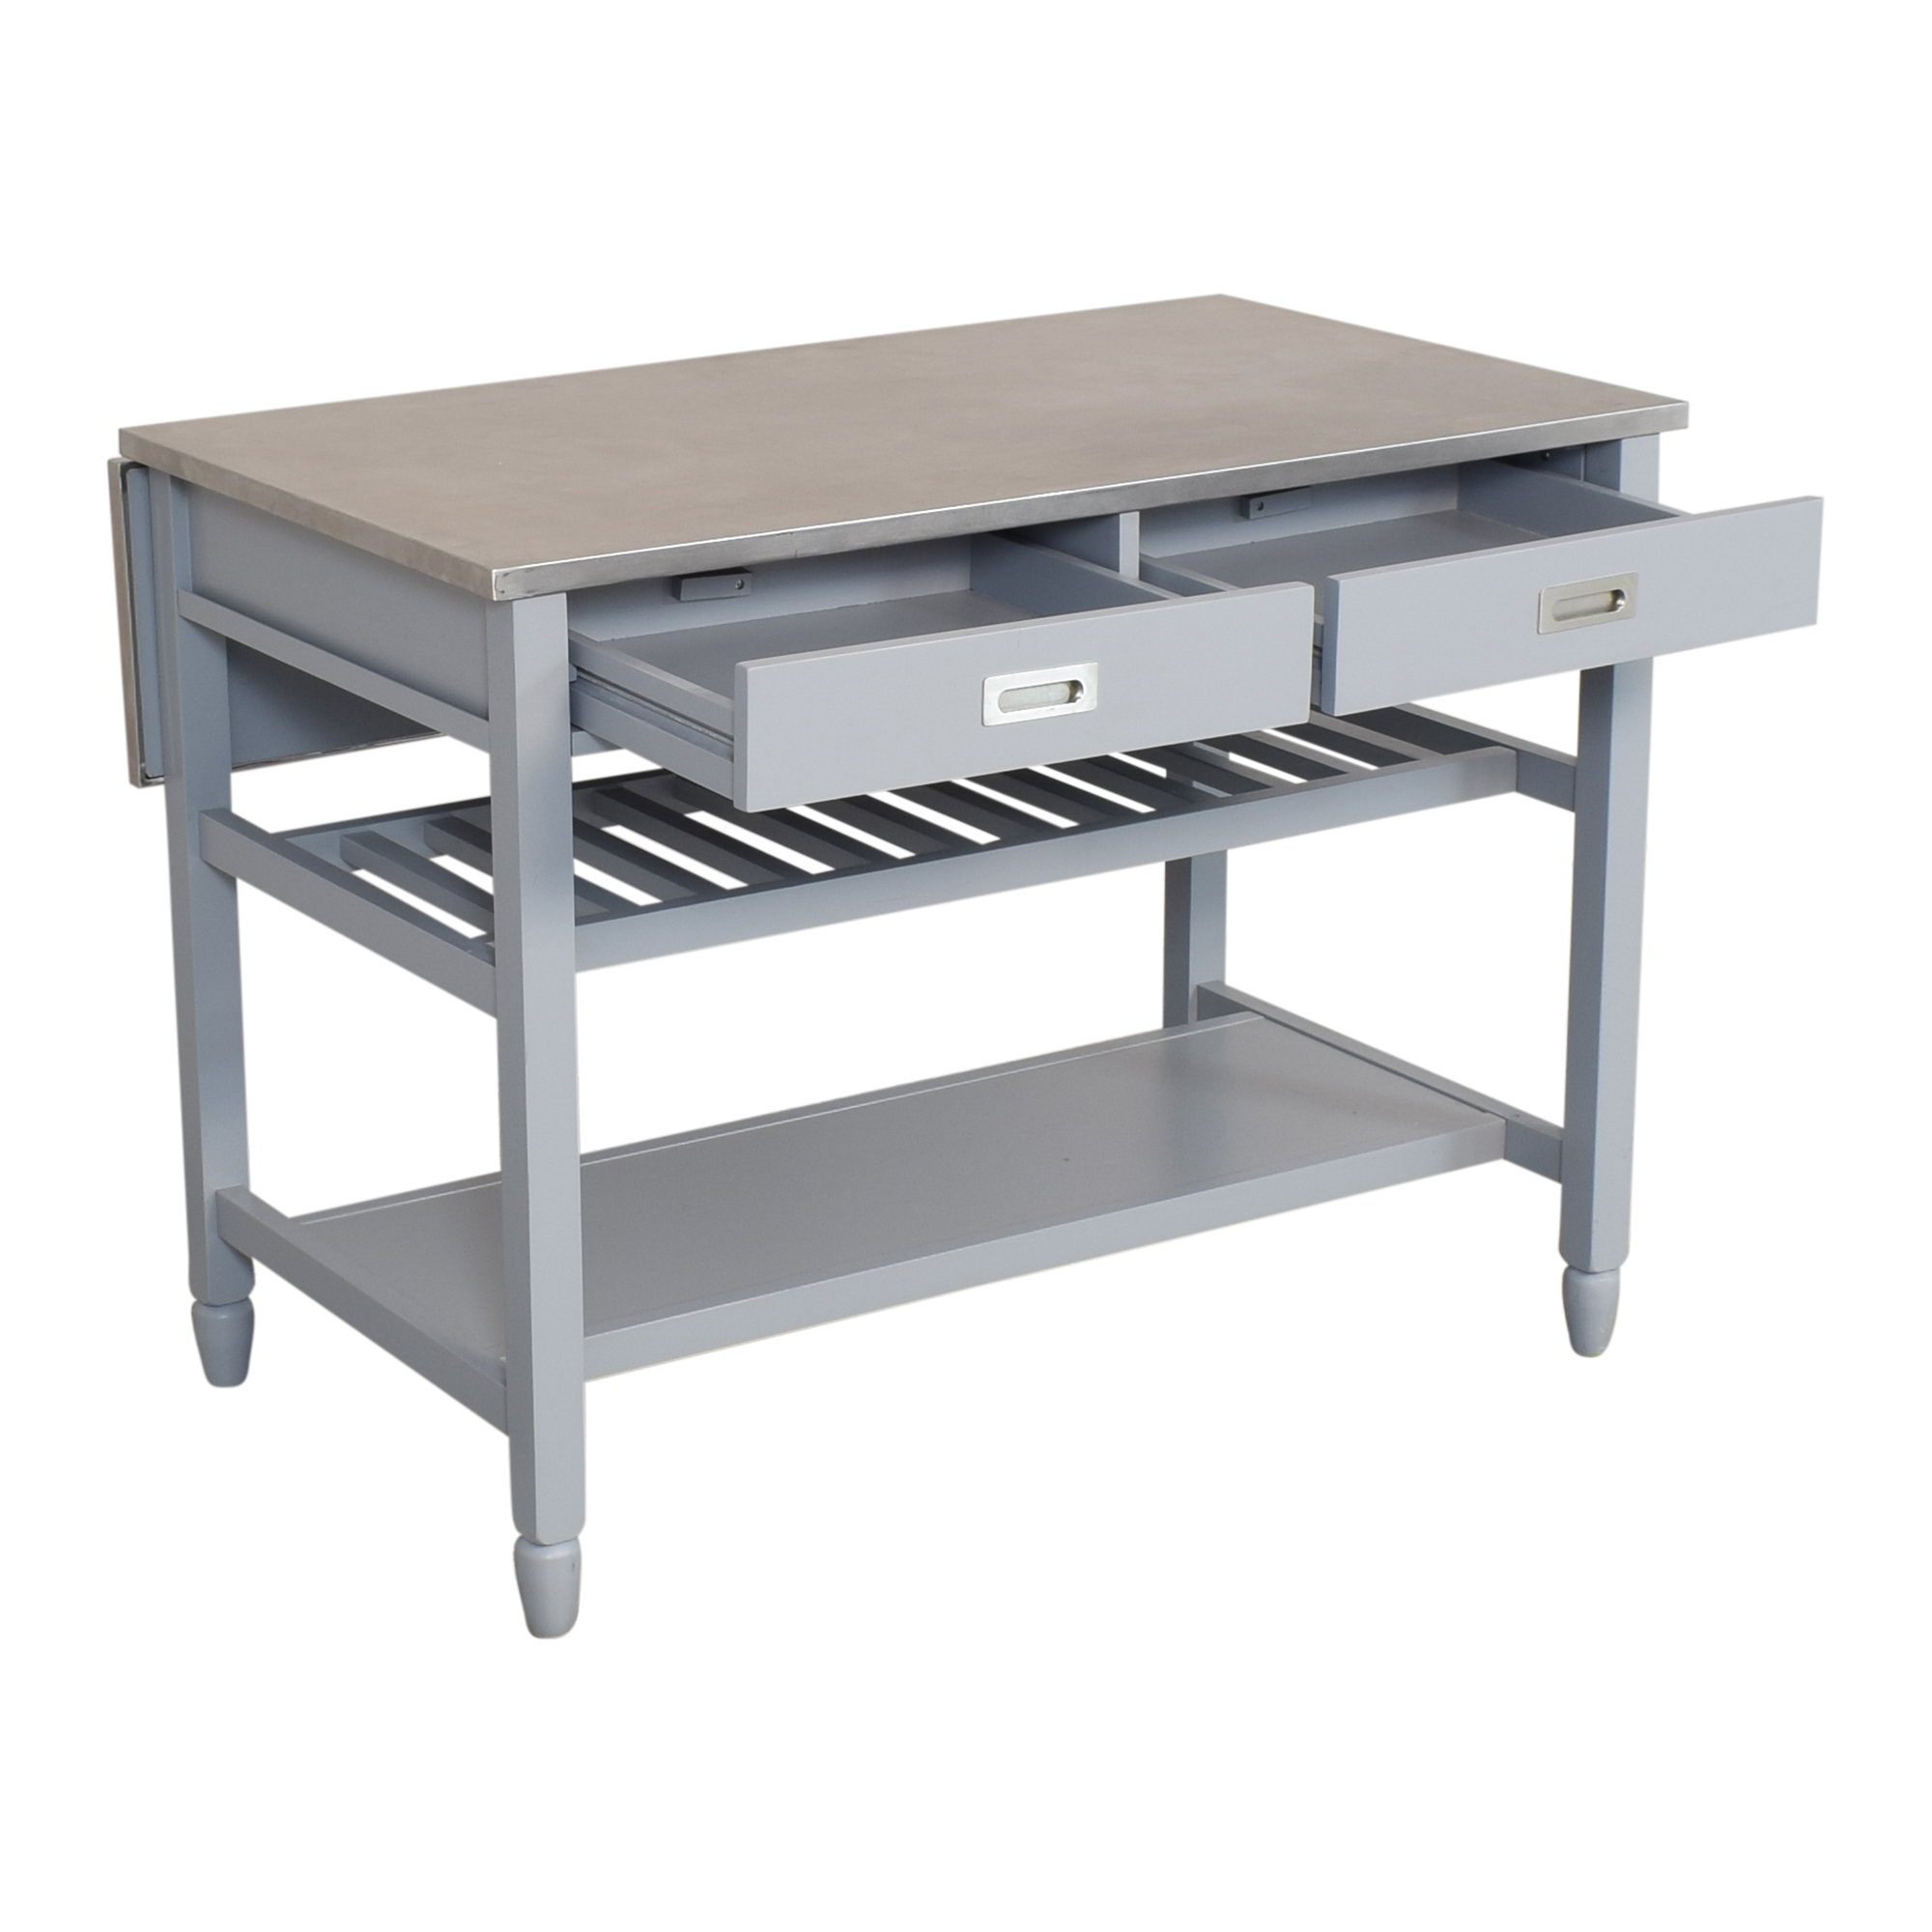 Crate & Barrel Crate & Barrel Sheridan Expandable Kitchen Island Utility Tables